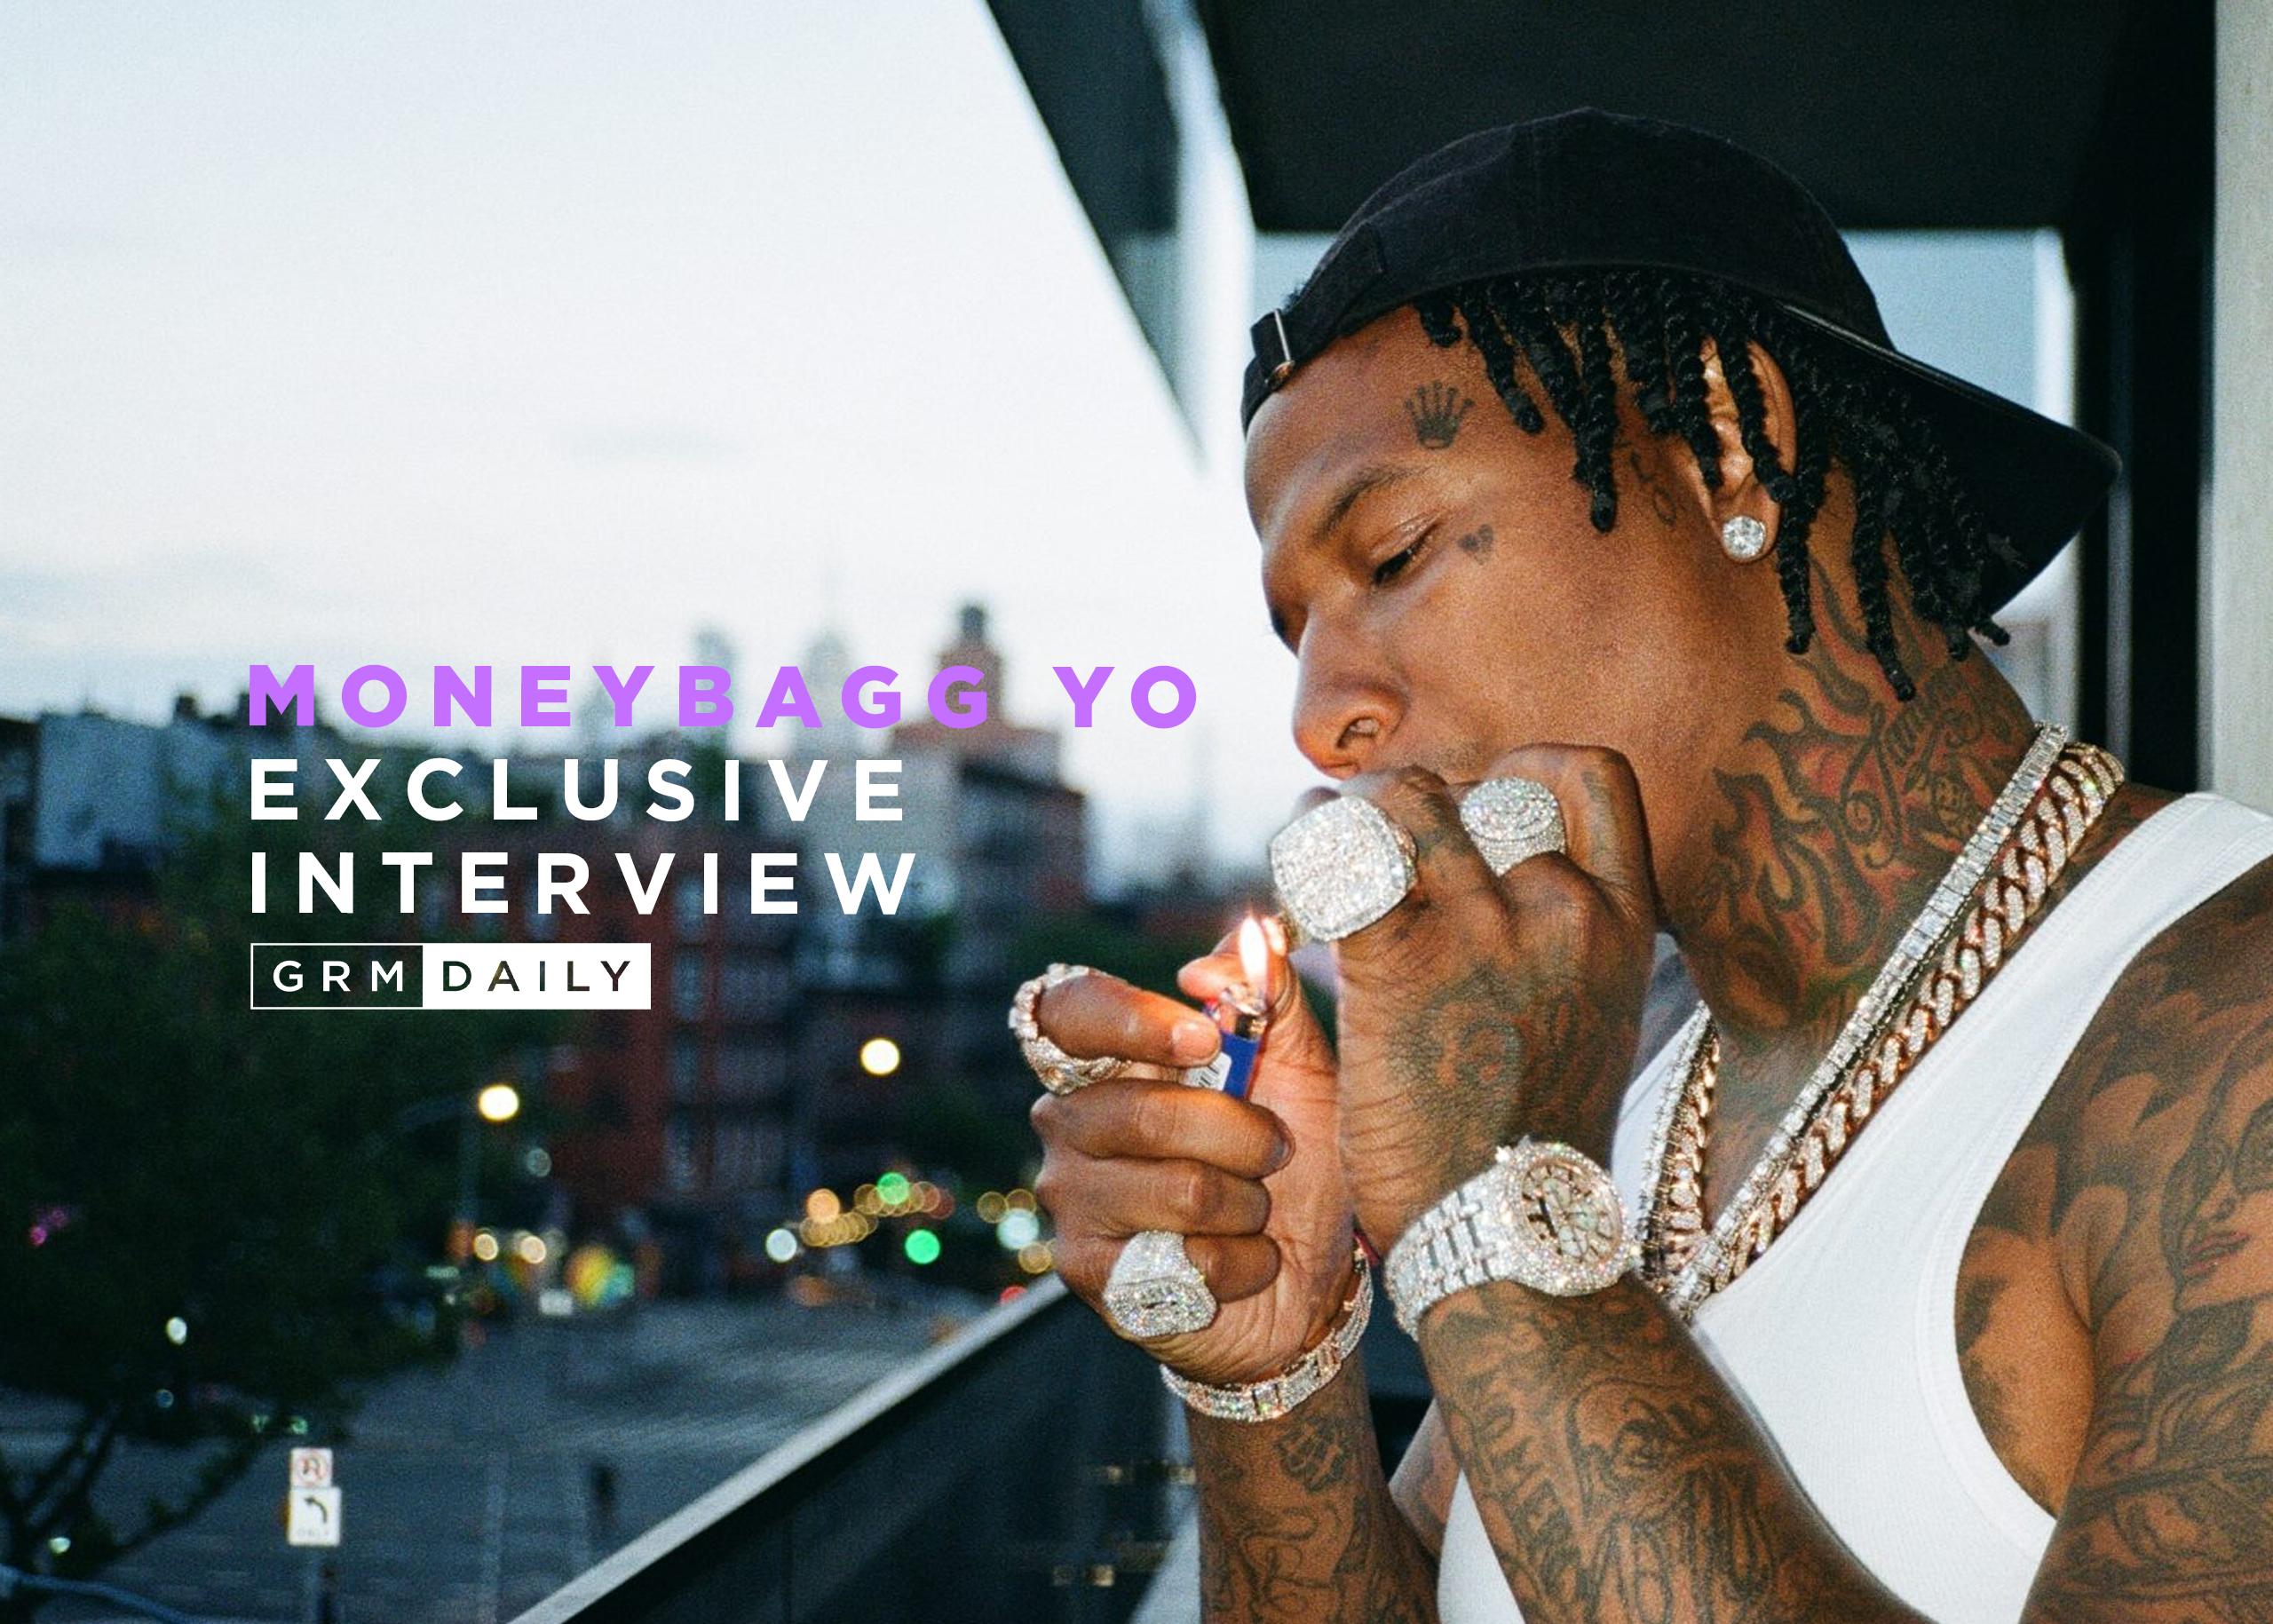 Moneybagg Yo GRM interview